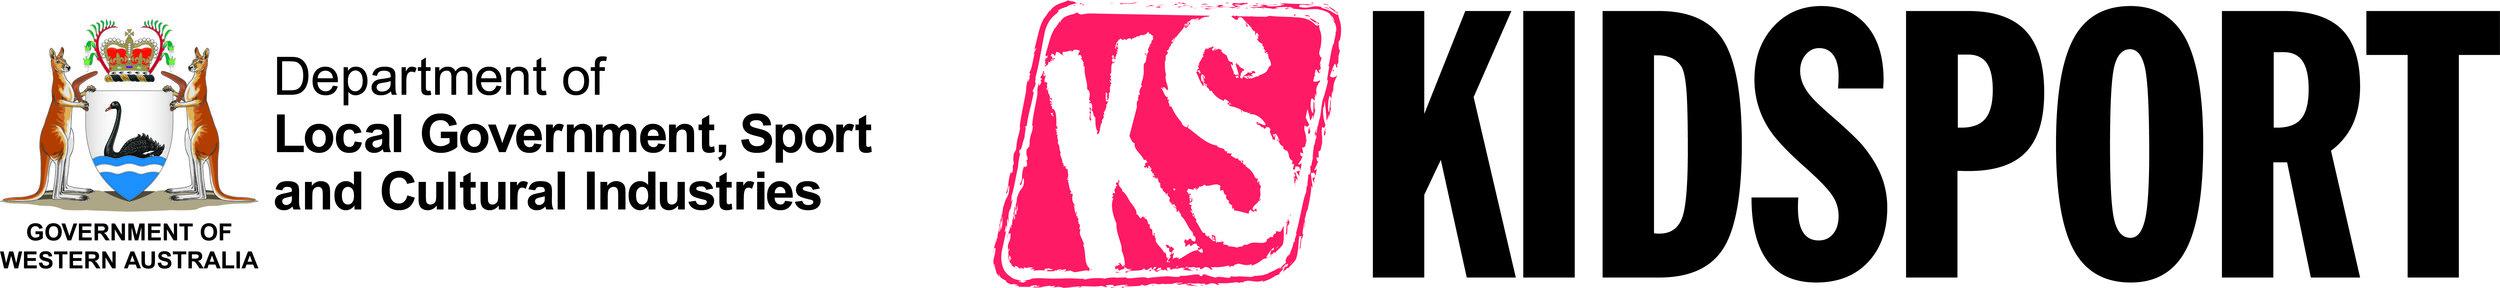 KidSport logo  (2).jpg